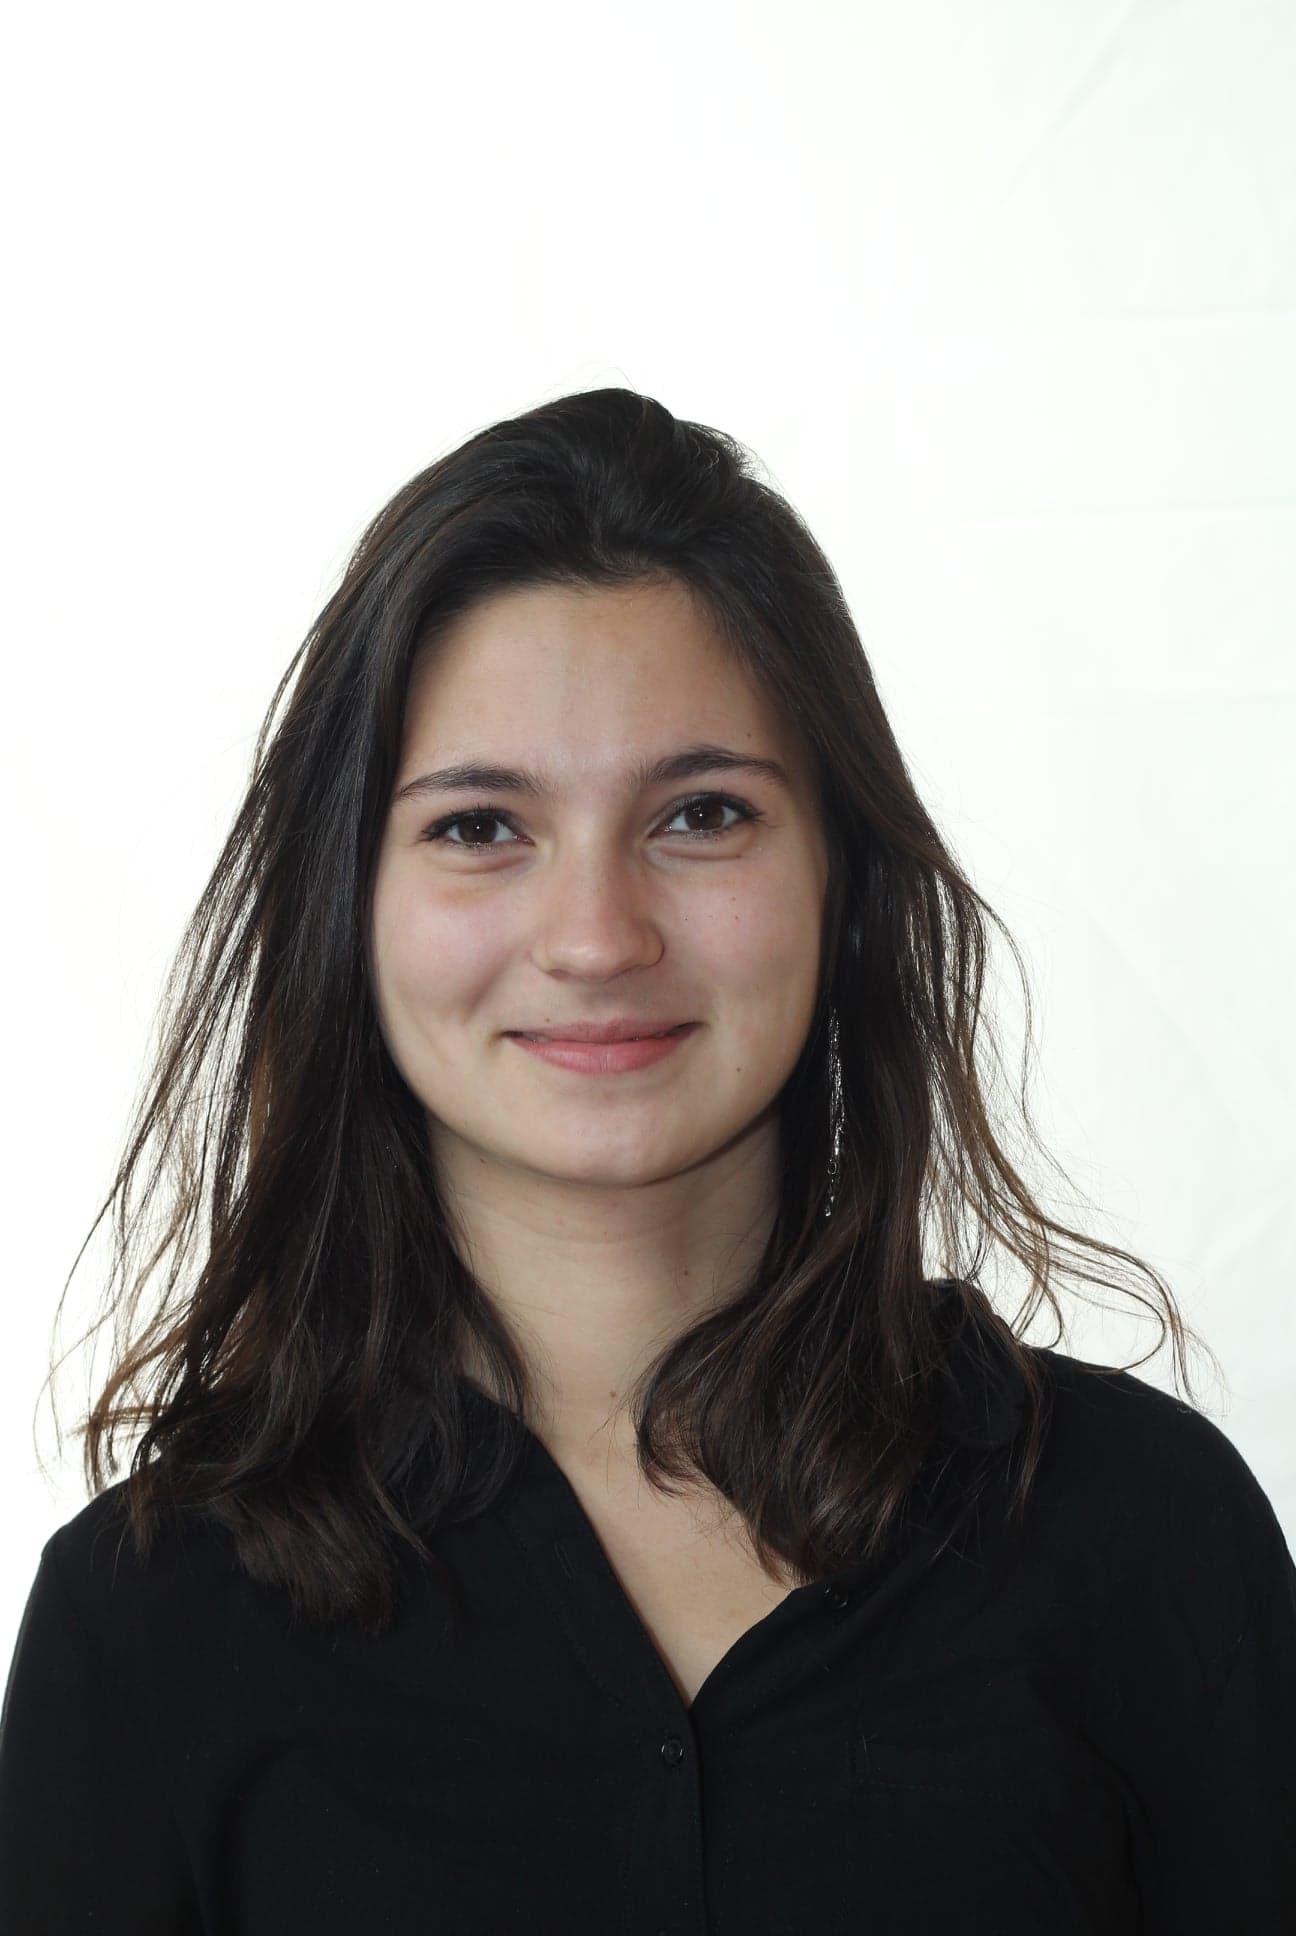 Joséphine Larrieu